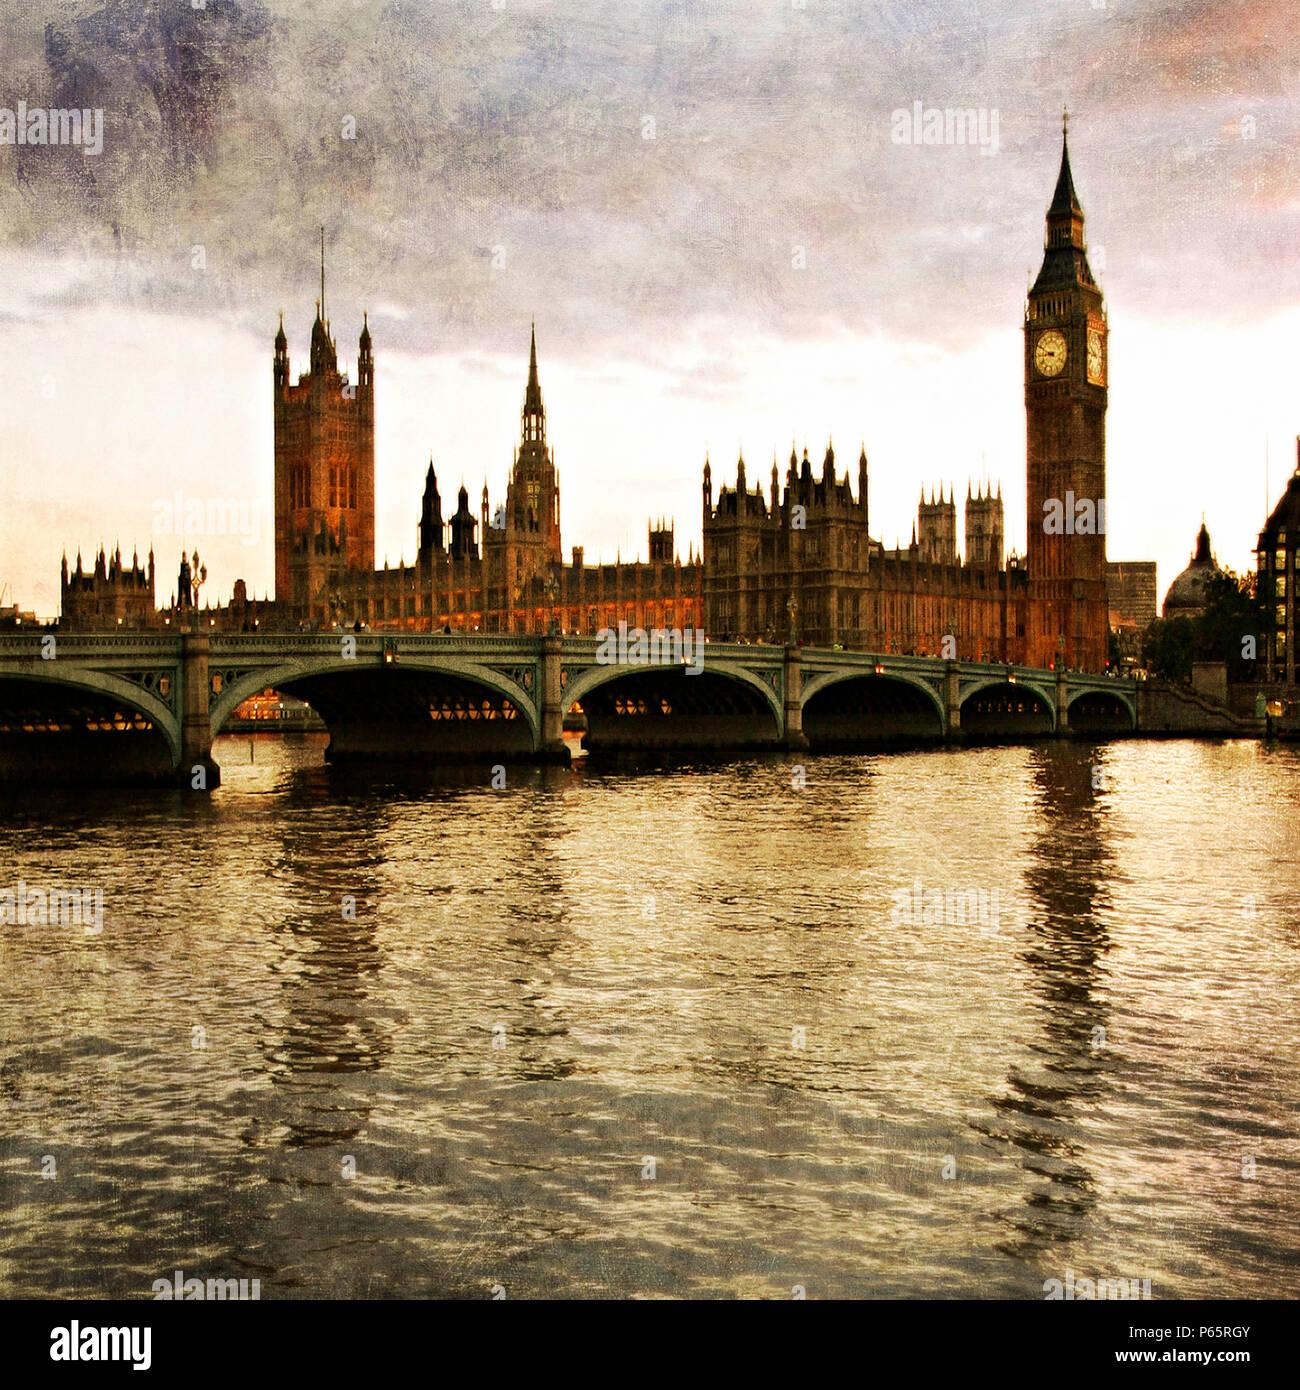 Westminster Bridge and Big Ben, London, UK - Stock Image